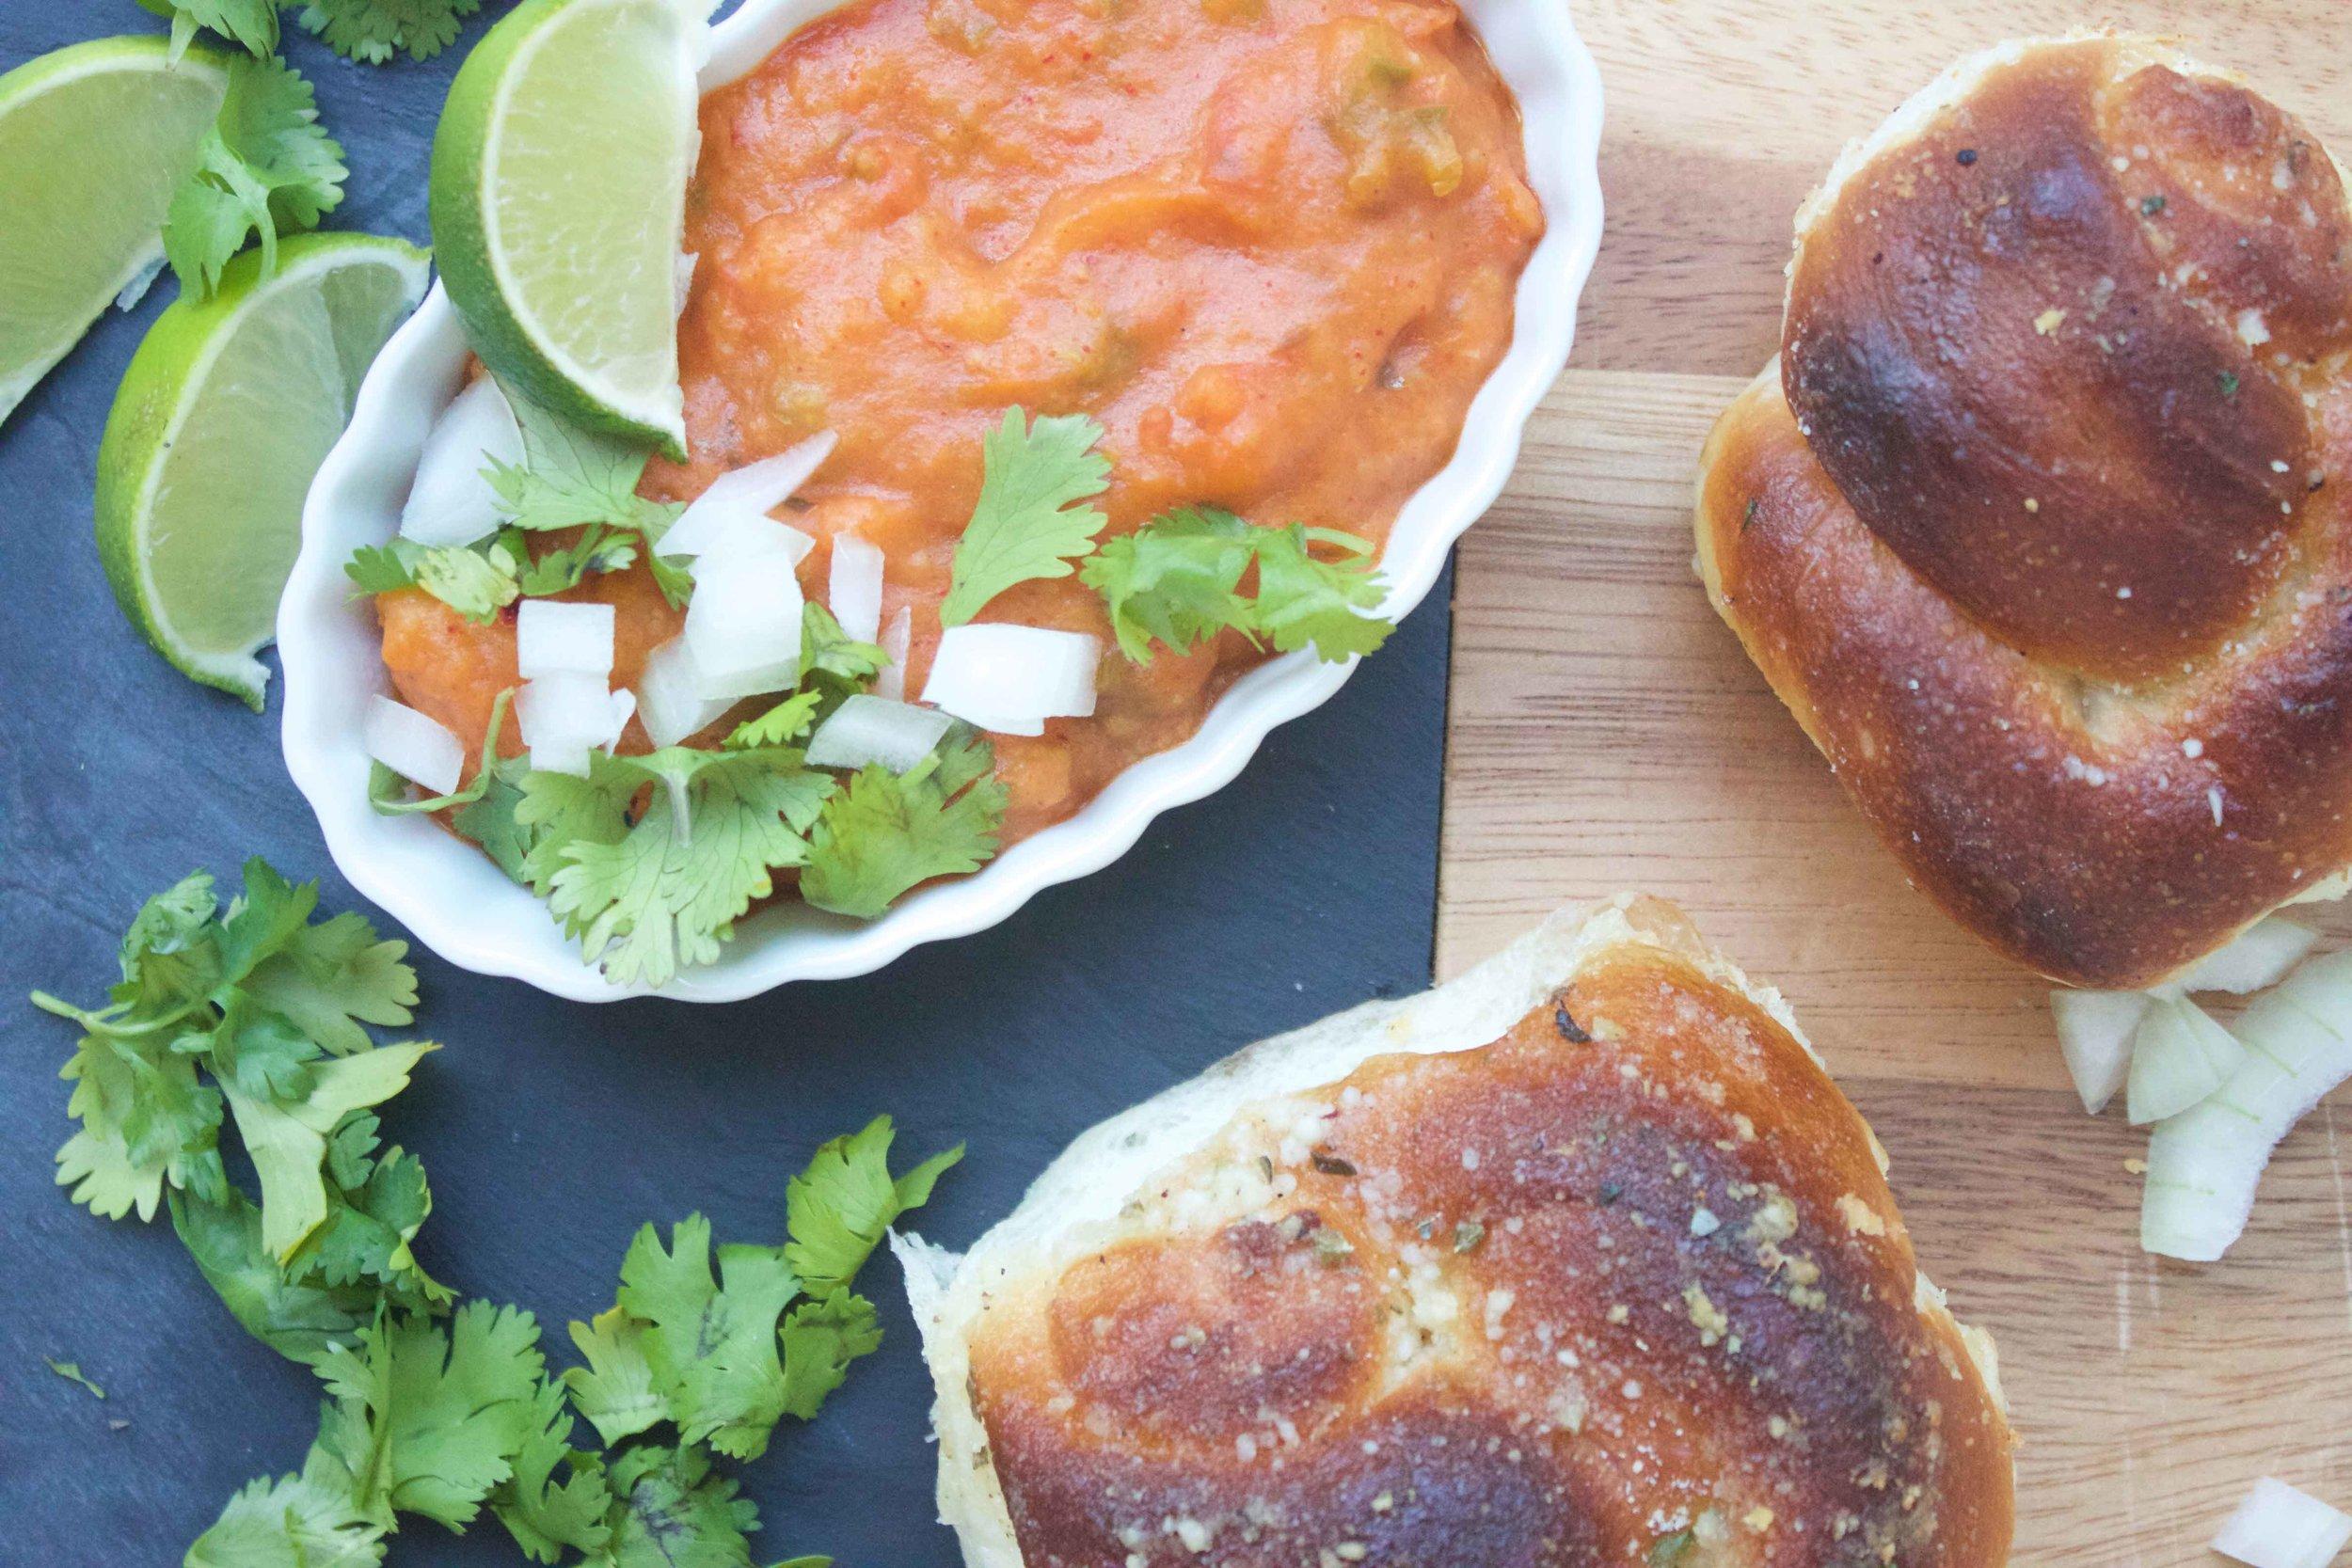 mumbai pav bhaji recipe charisma shah vegetarian vegan